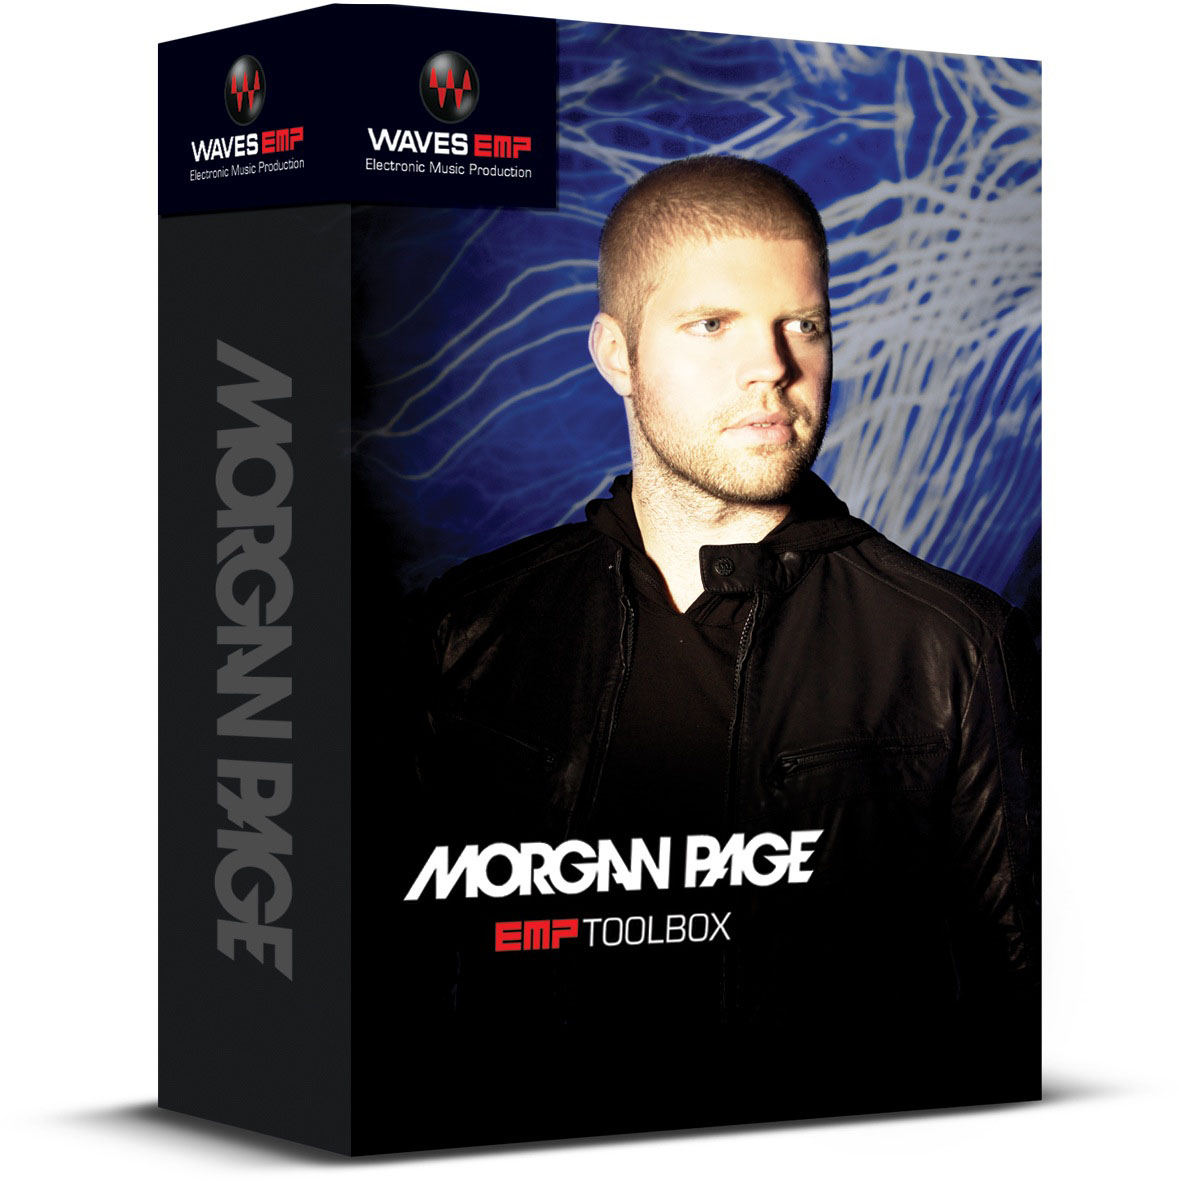 http://clynemedia.com/waves/EMP_MorganPage/MorganPageToolbox.jpg